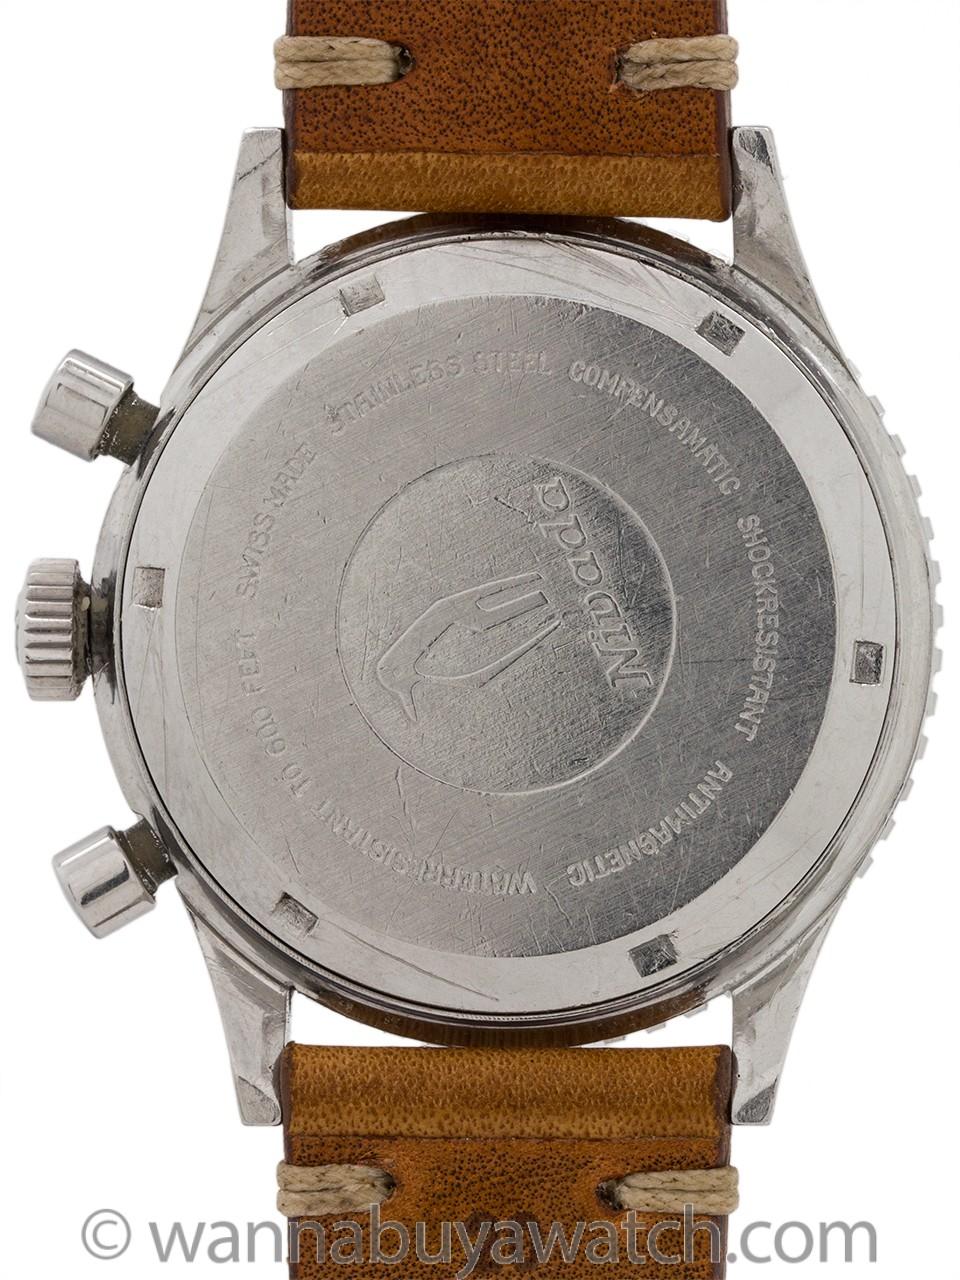 Nivada Grenchen Aviator Chronograph circa 1960's